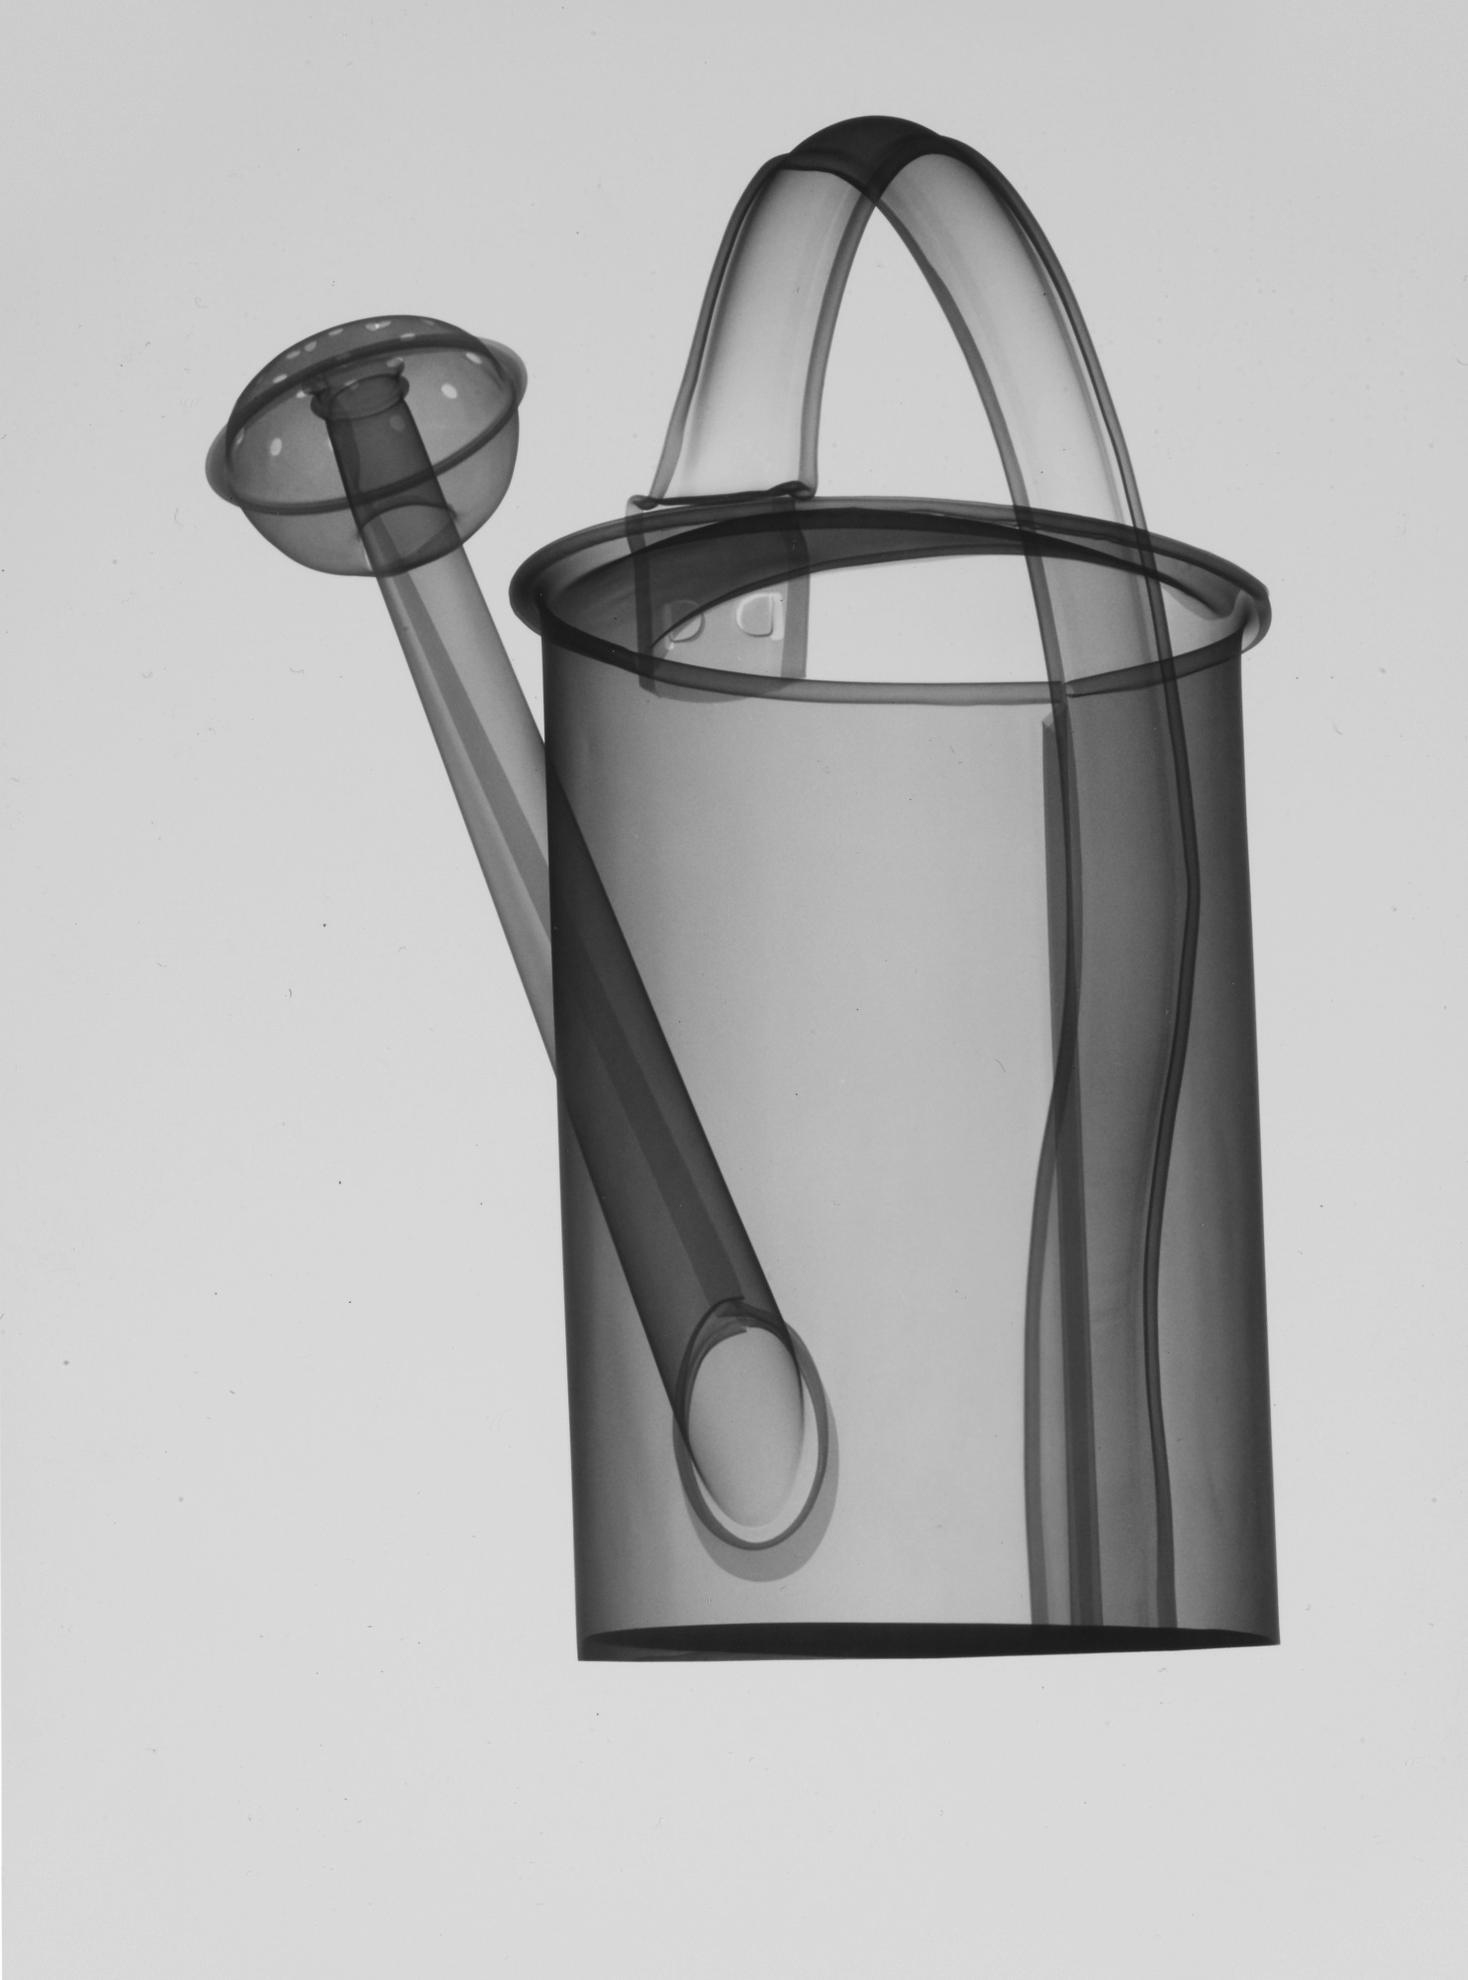 Paul Fries - Watering Can-1950